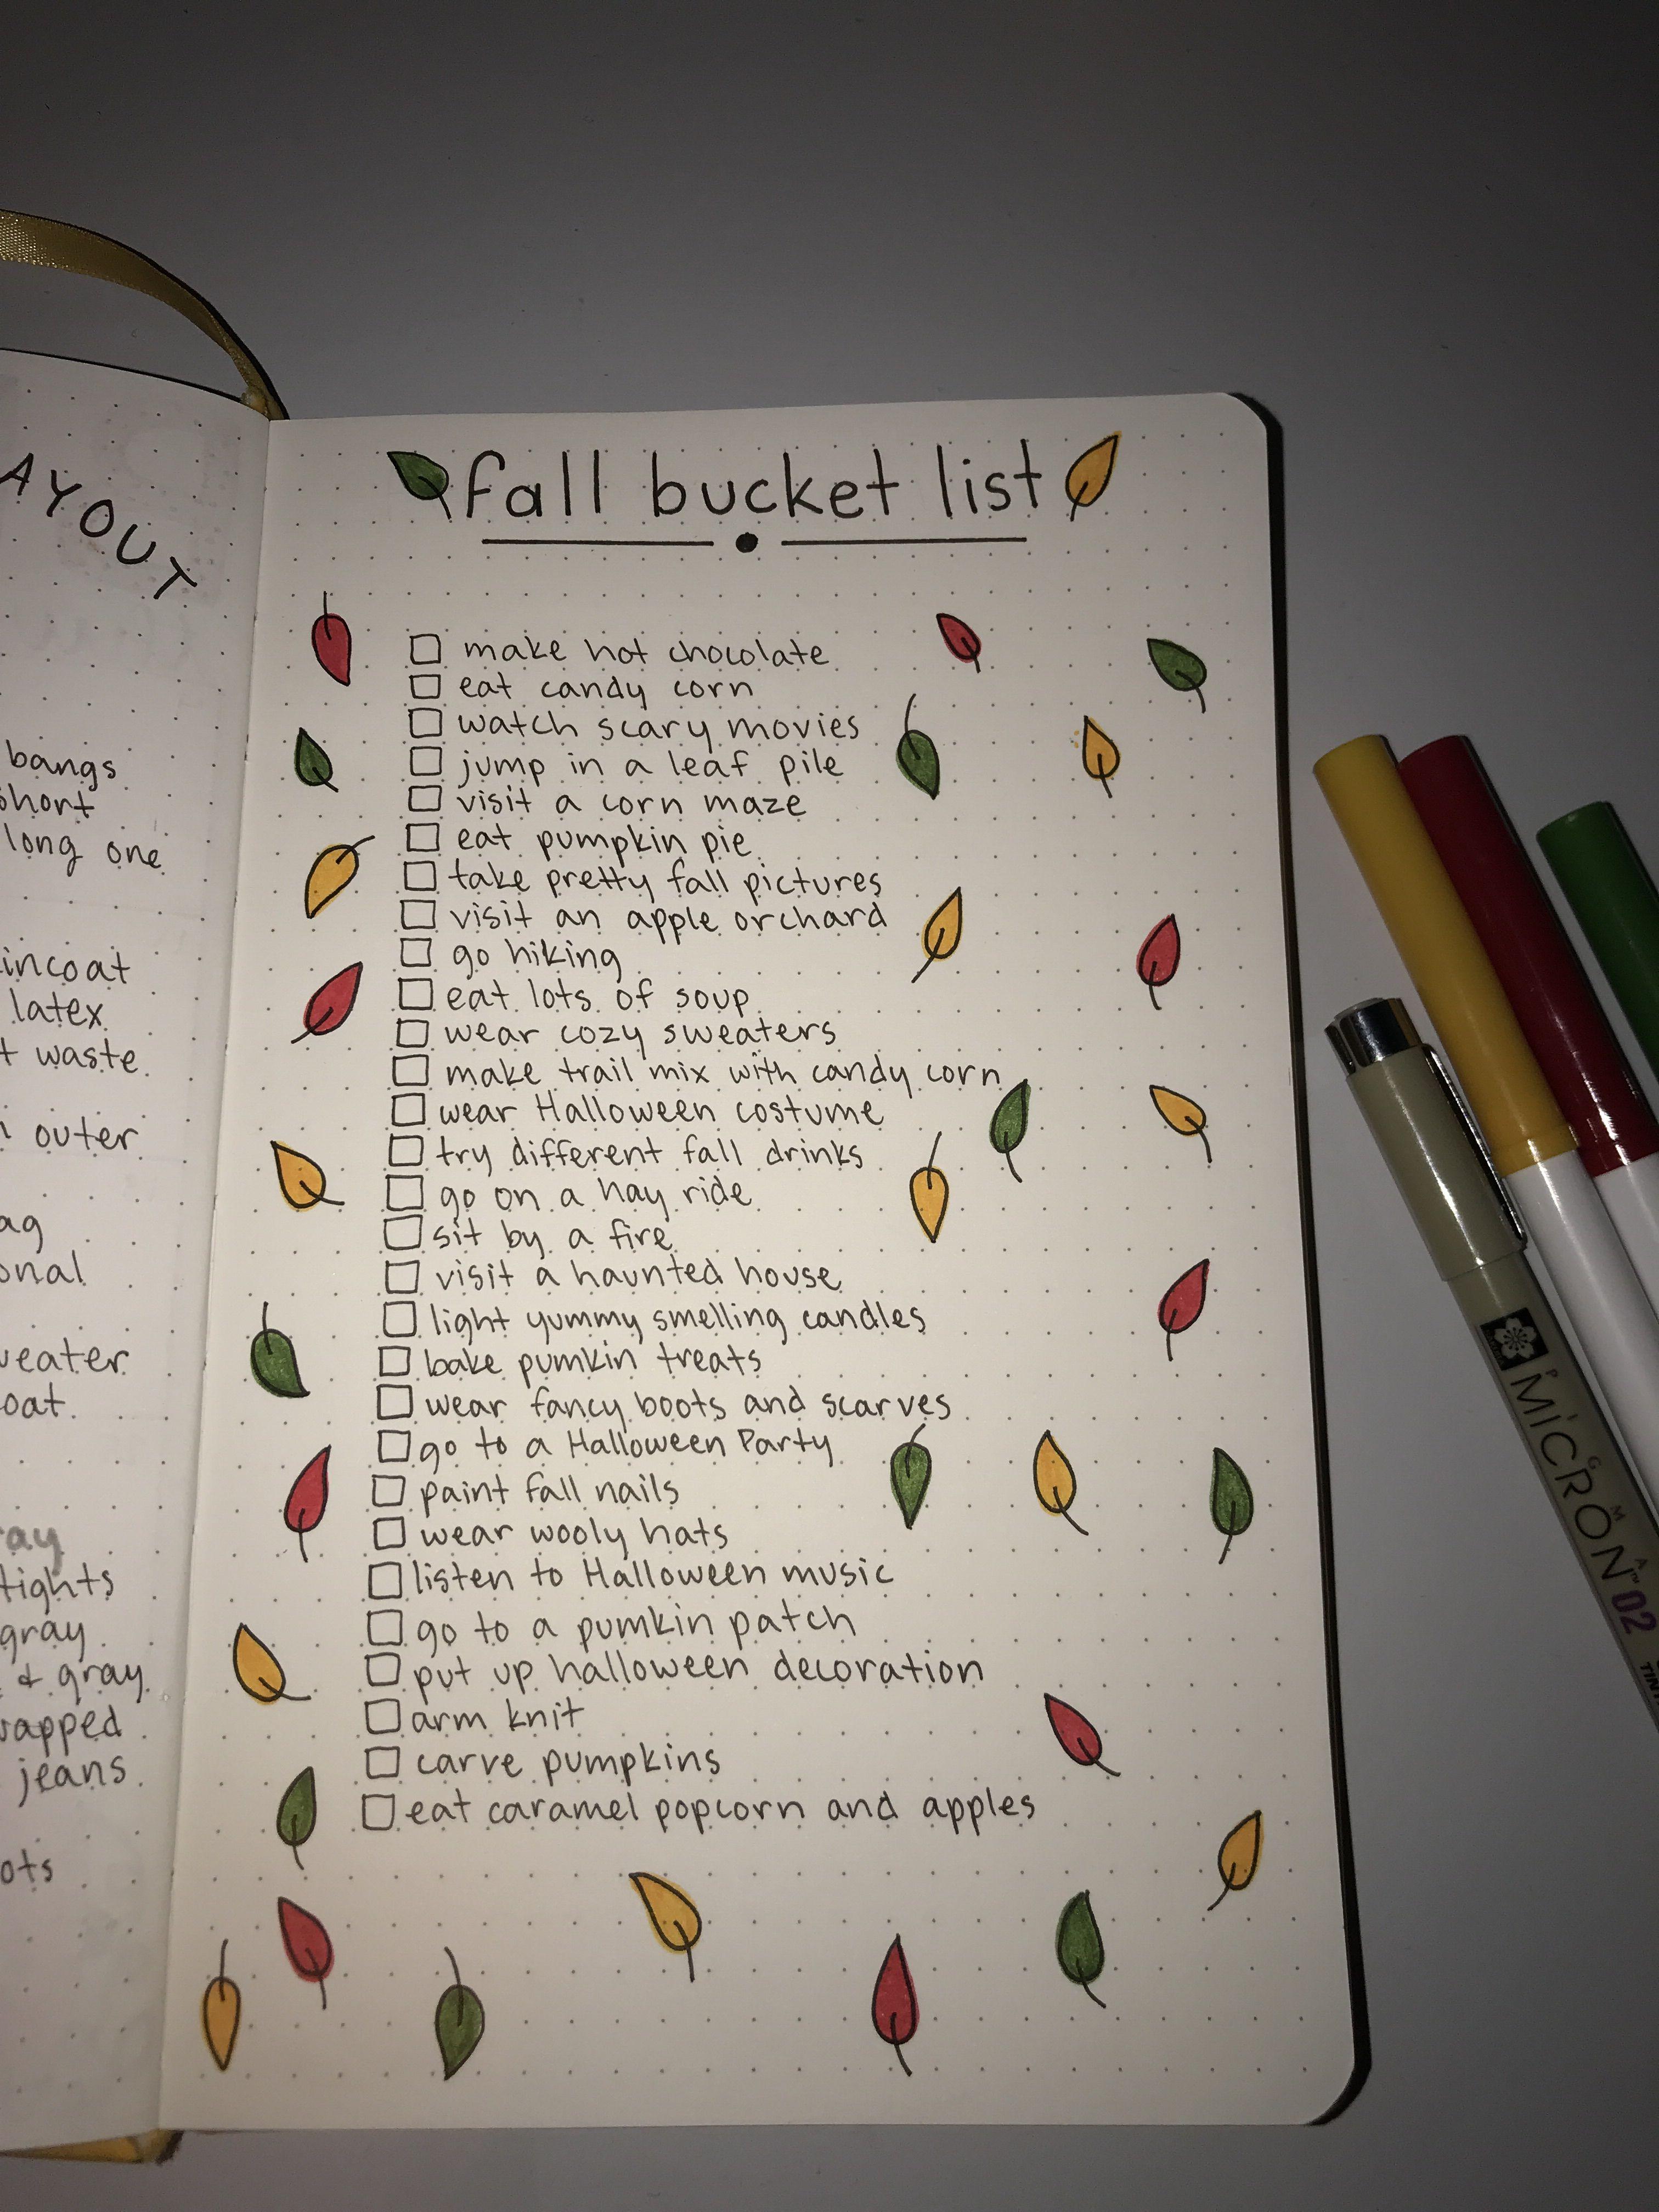 Fall Bucket List For Bullet Journal Fall Bucket List Bullet Journal Bullet Journal Ideas Pages